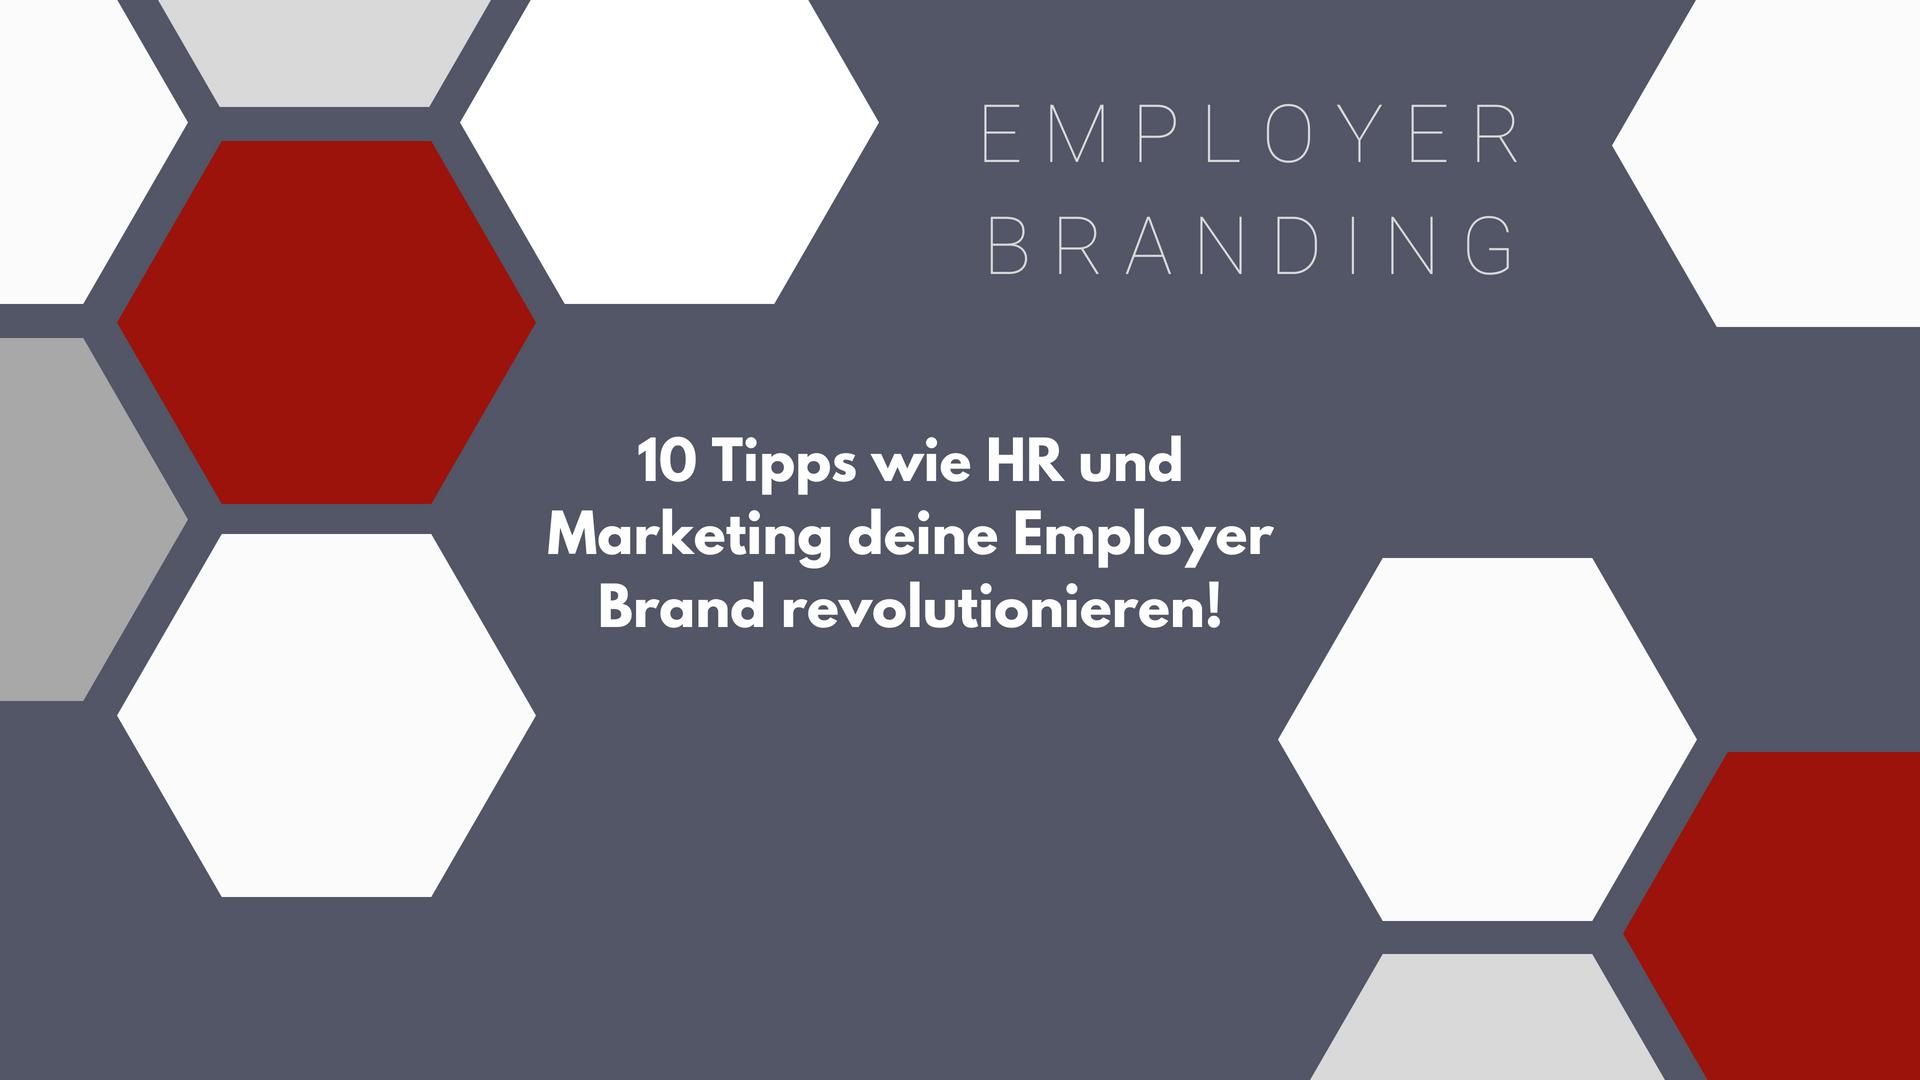 10 tipps employer branding marketing hr.png